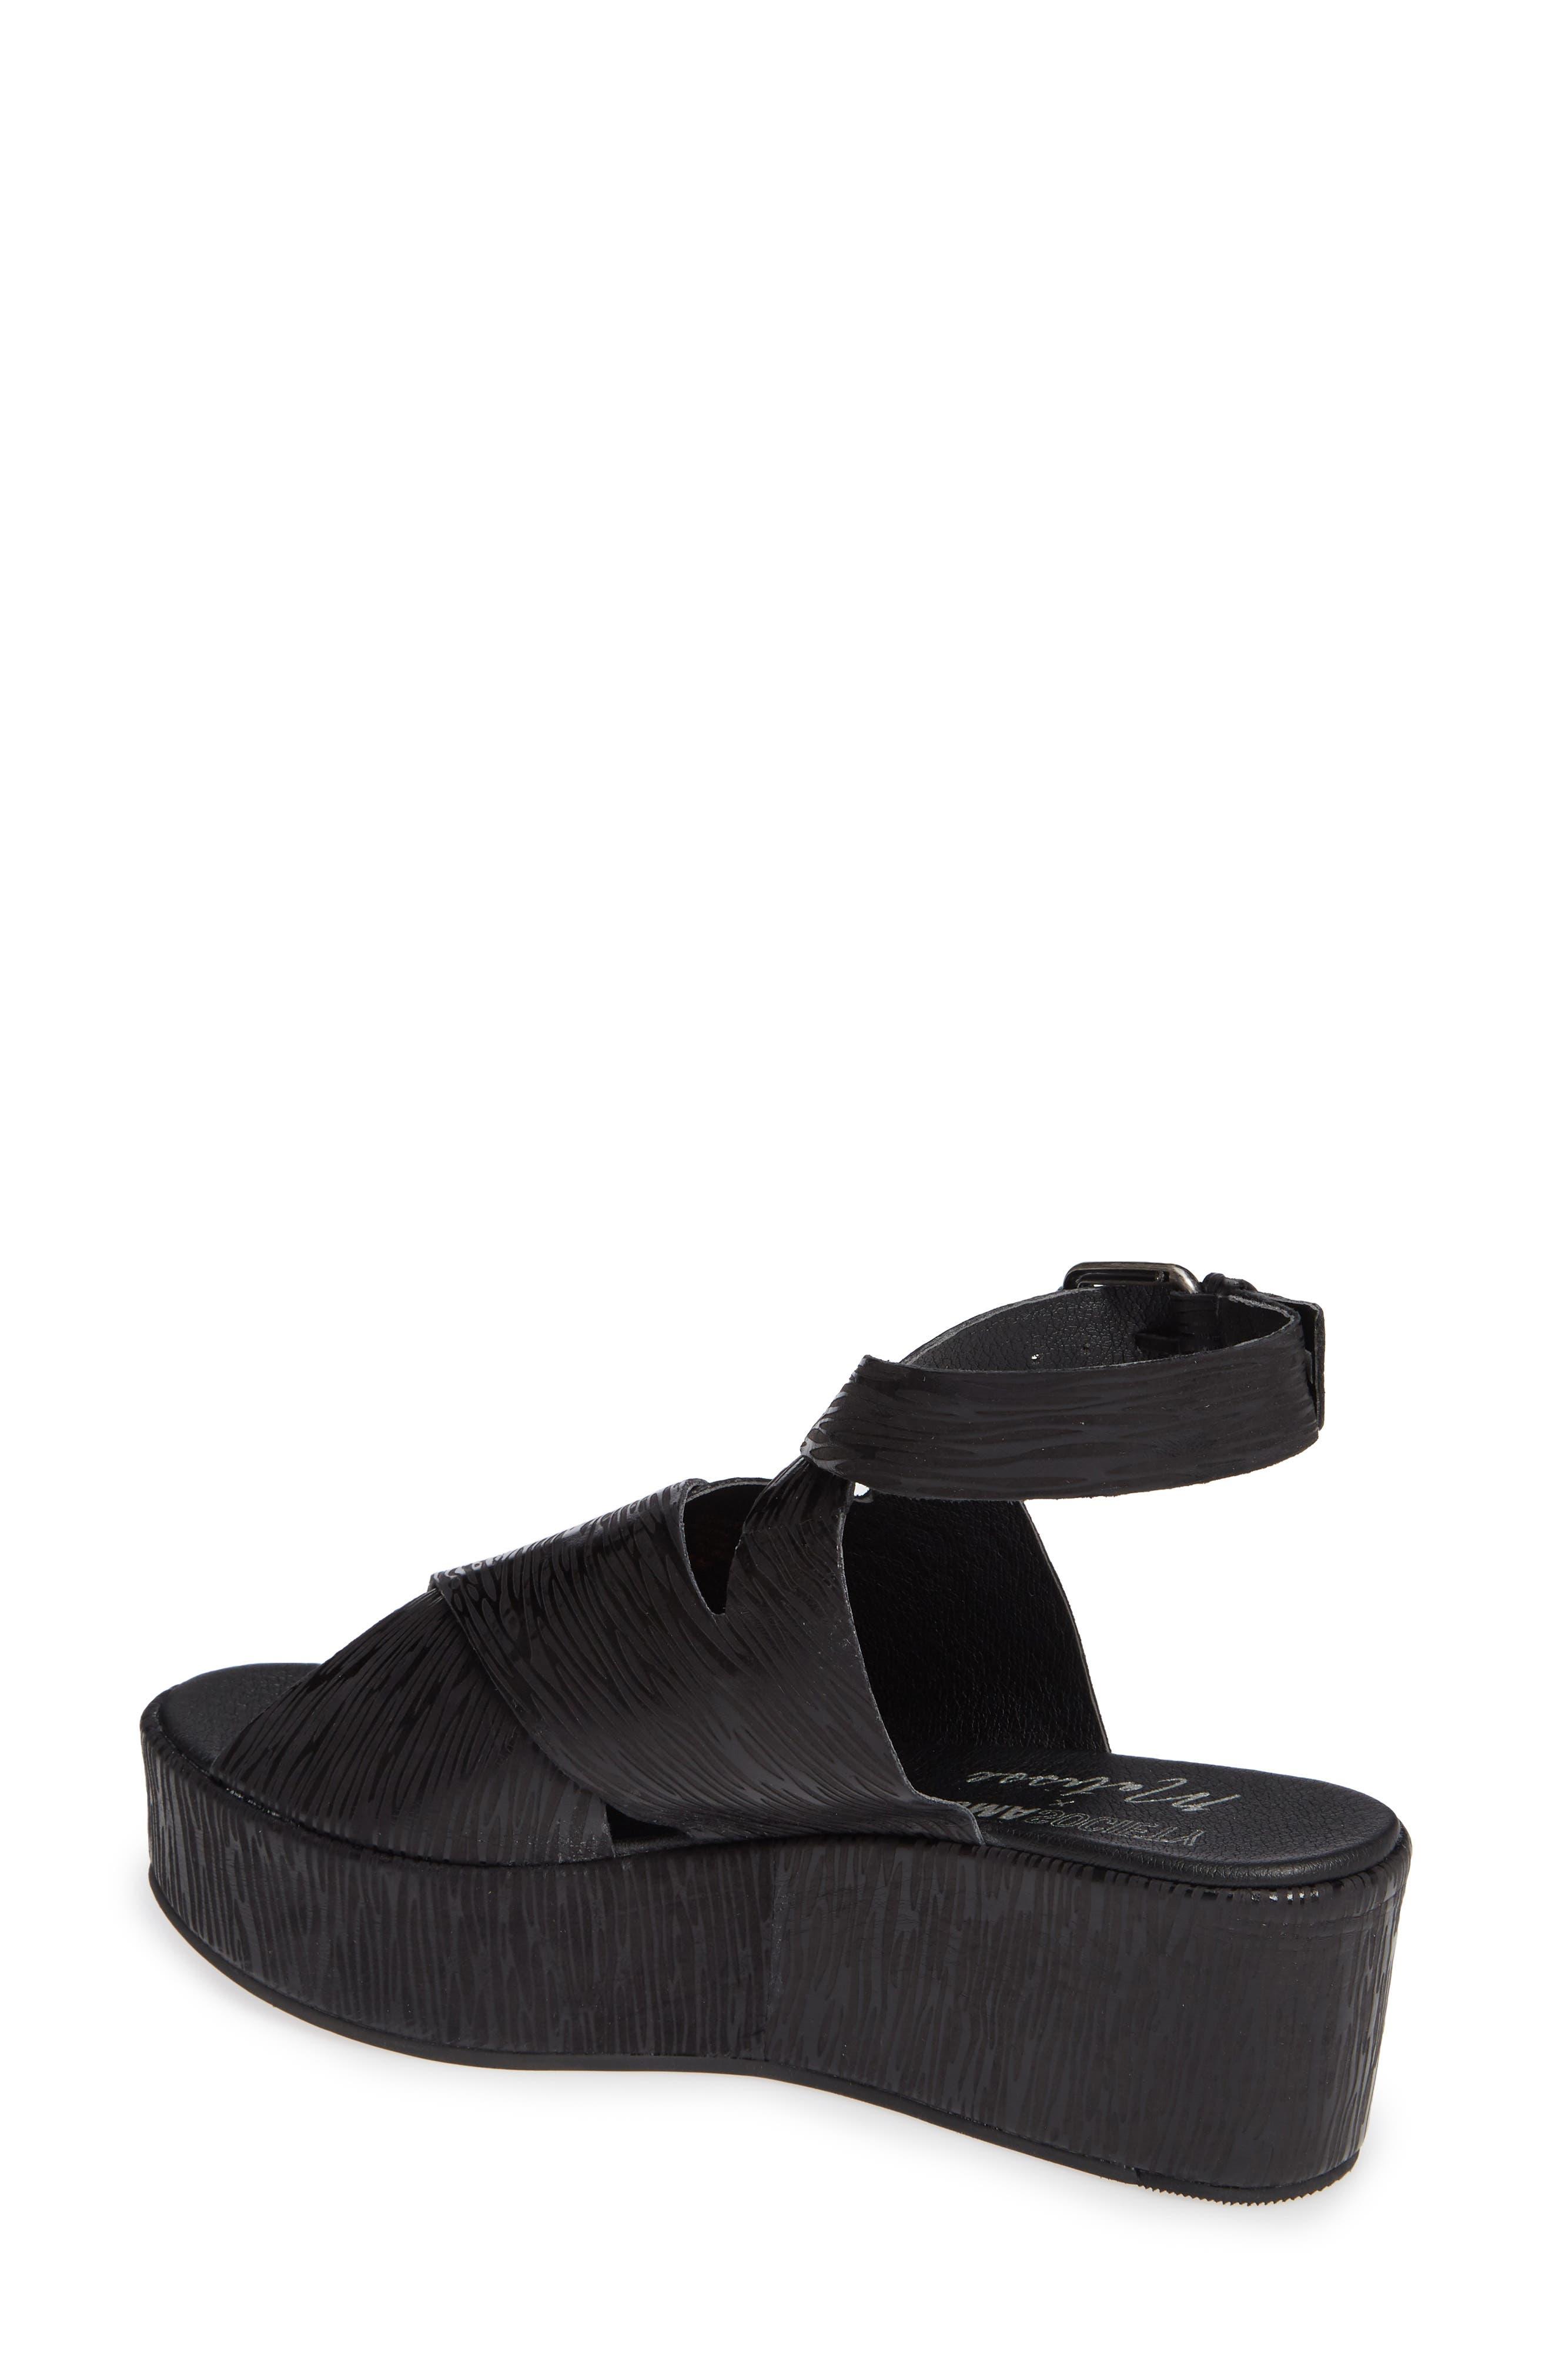 Runway Wedge Sandal,                             Alternate thumbnail 2, color,                             Black Lizard Print Leather